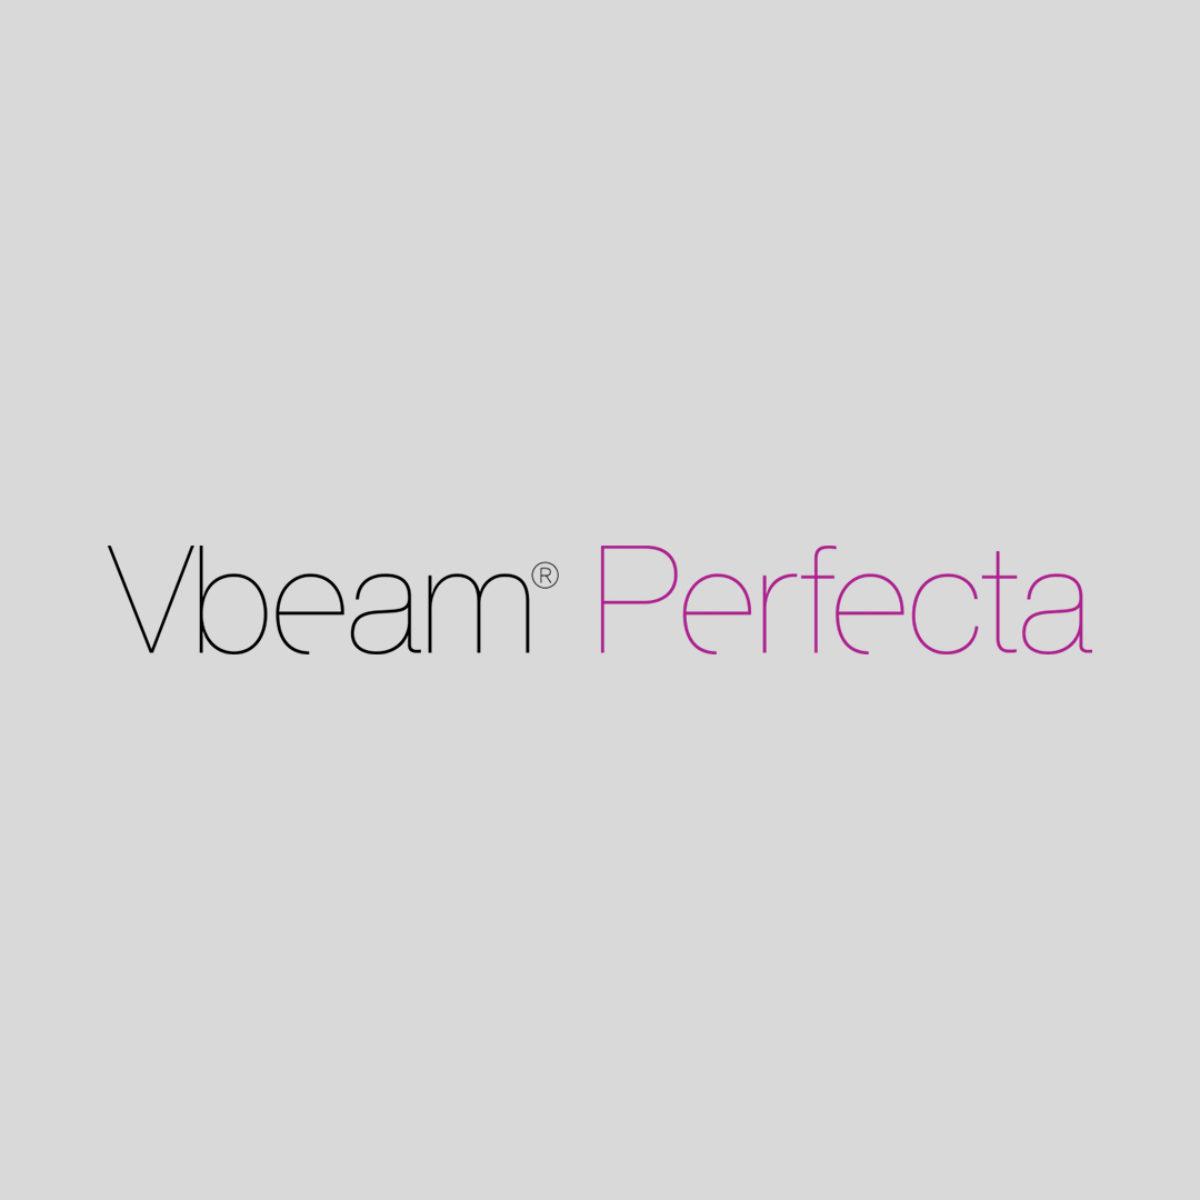 Vbeam Perfecta